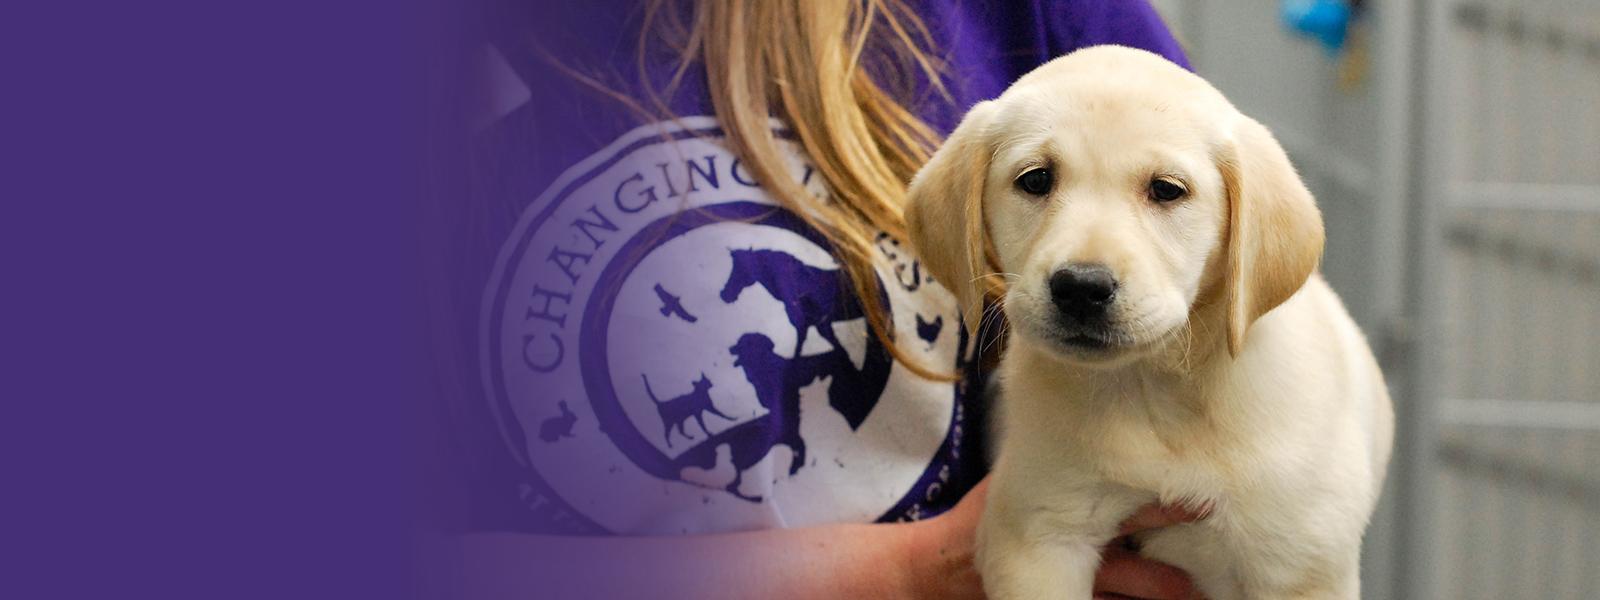 Animal Rescue League Of Iowa Inc